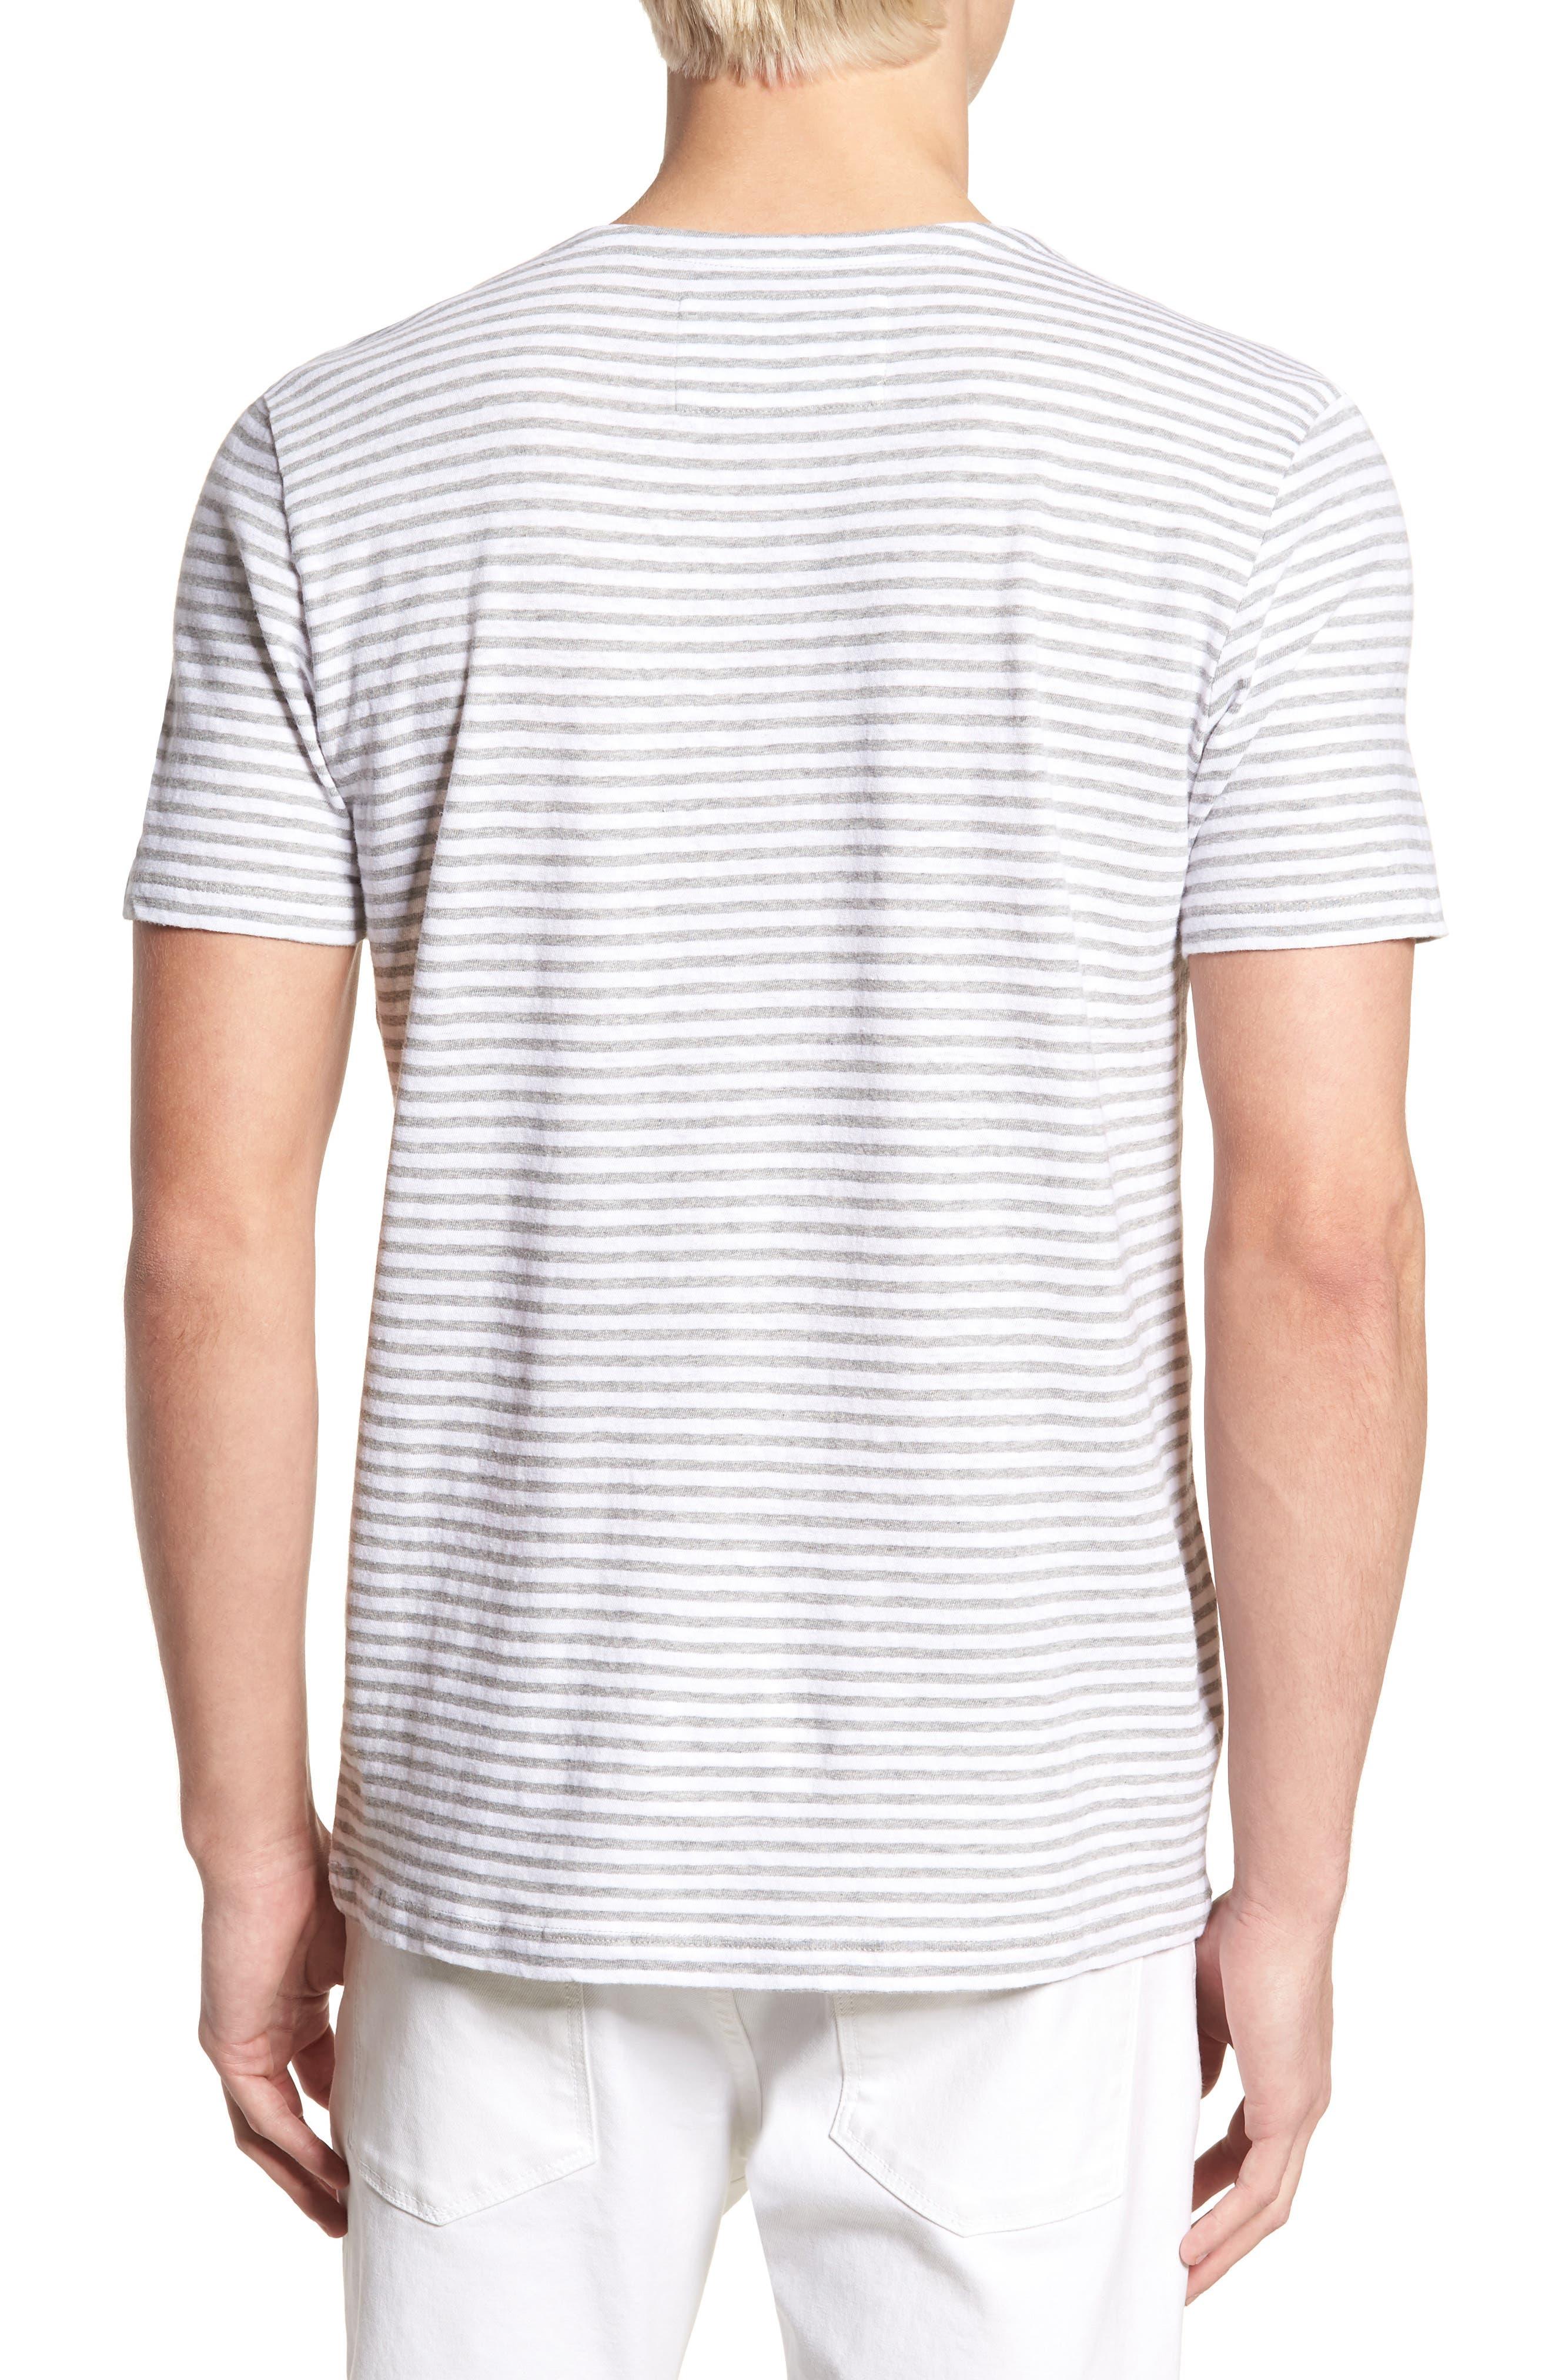 & Bros. Stripe Crewneck T-Shirt,                             Alternate thumbnail 2, color,                             156